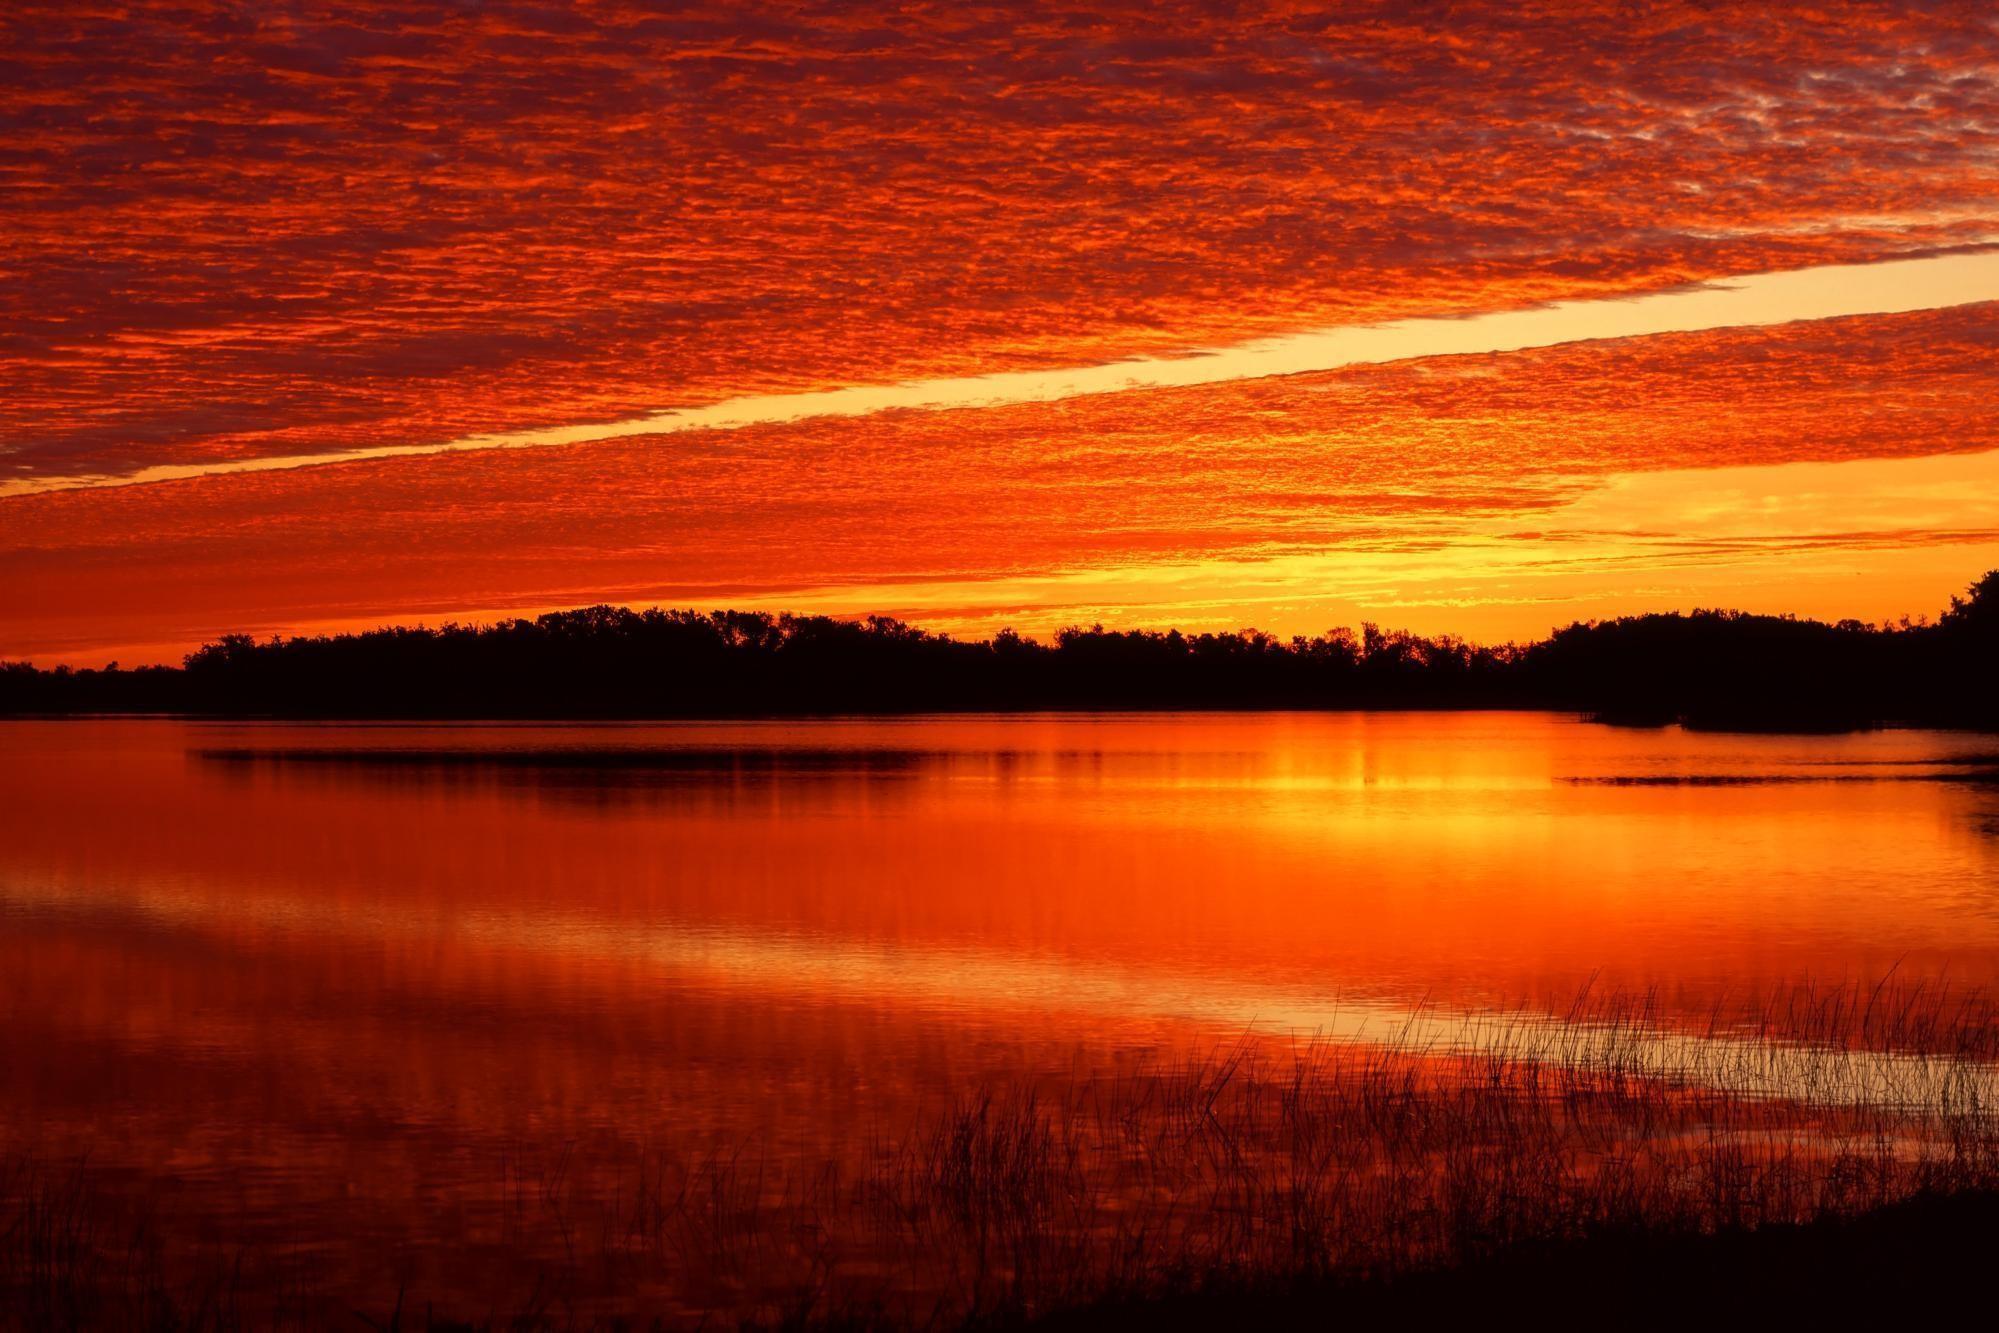 Sunrise Wallpapers For Desktop 59 Pictures